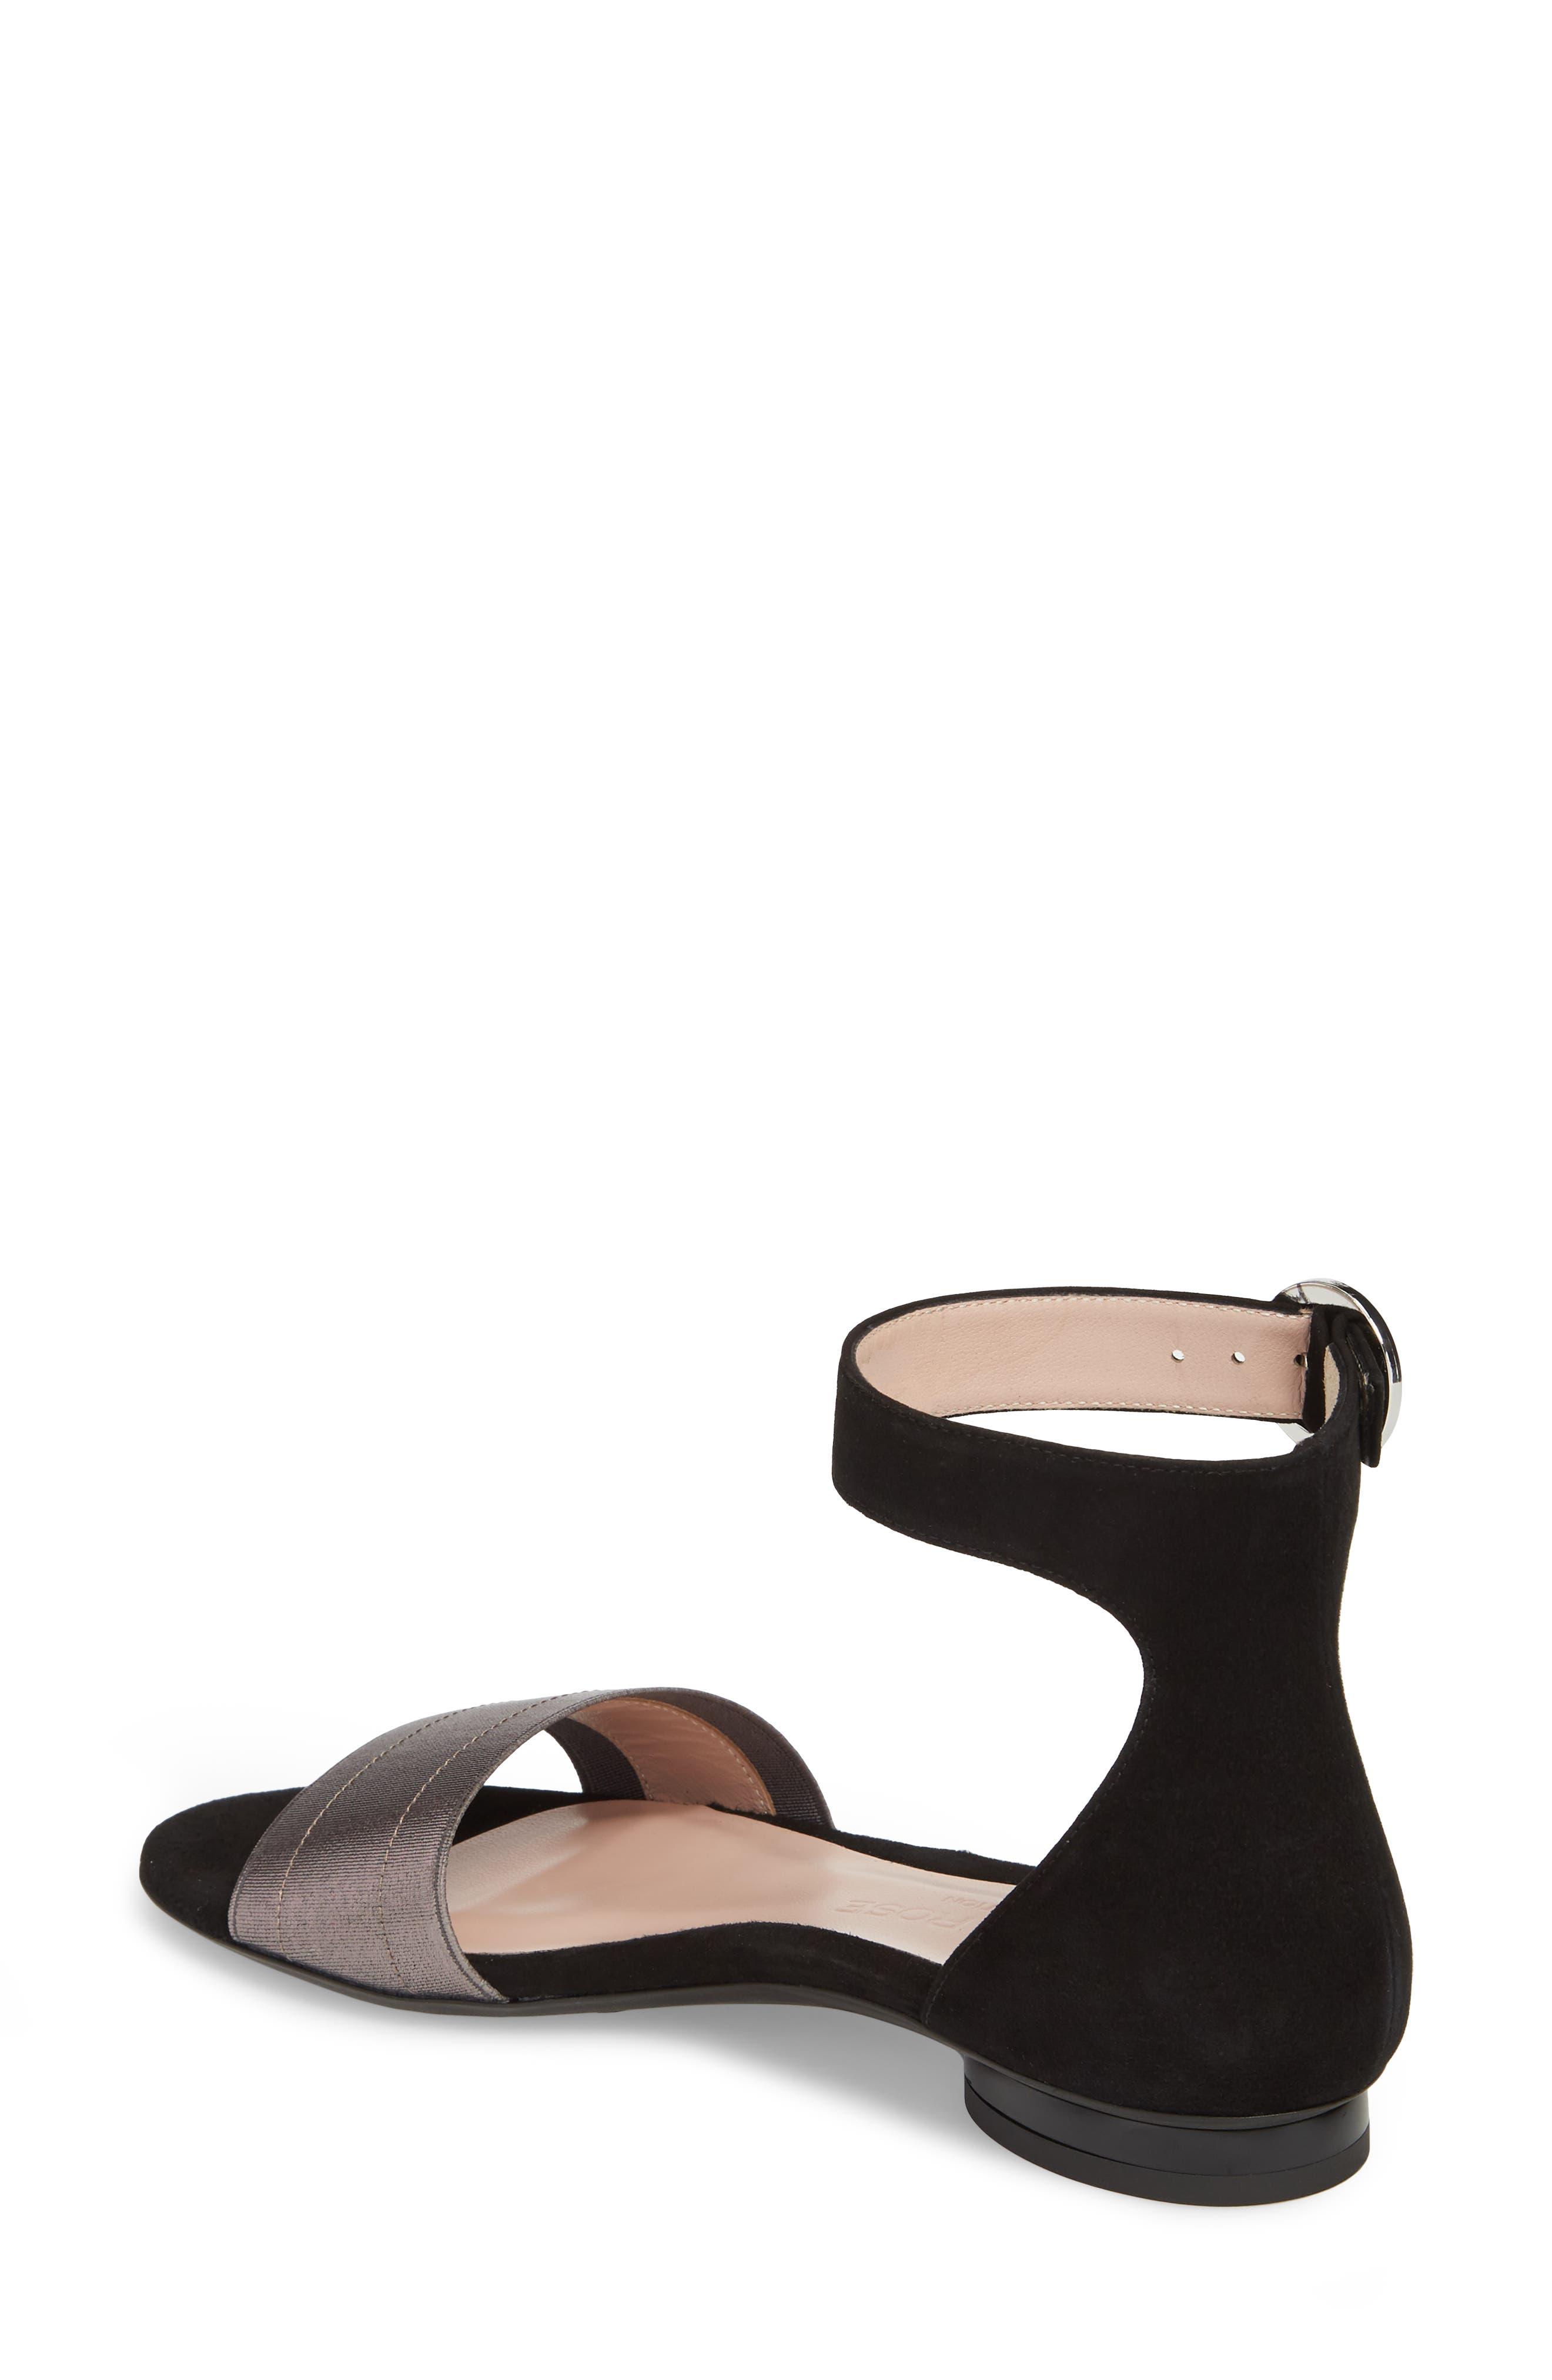 Donati Ankle Strap Sandal,                             Alternate thumbnail 2, color,                             Black/ Gunmetal Suede